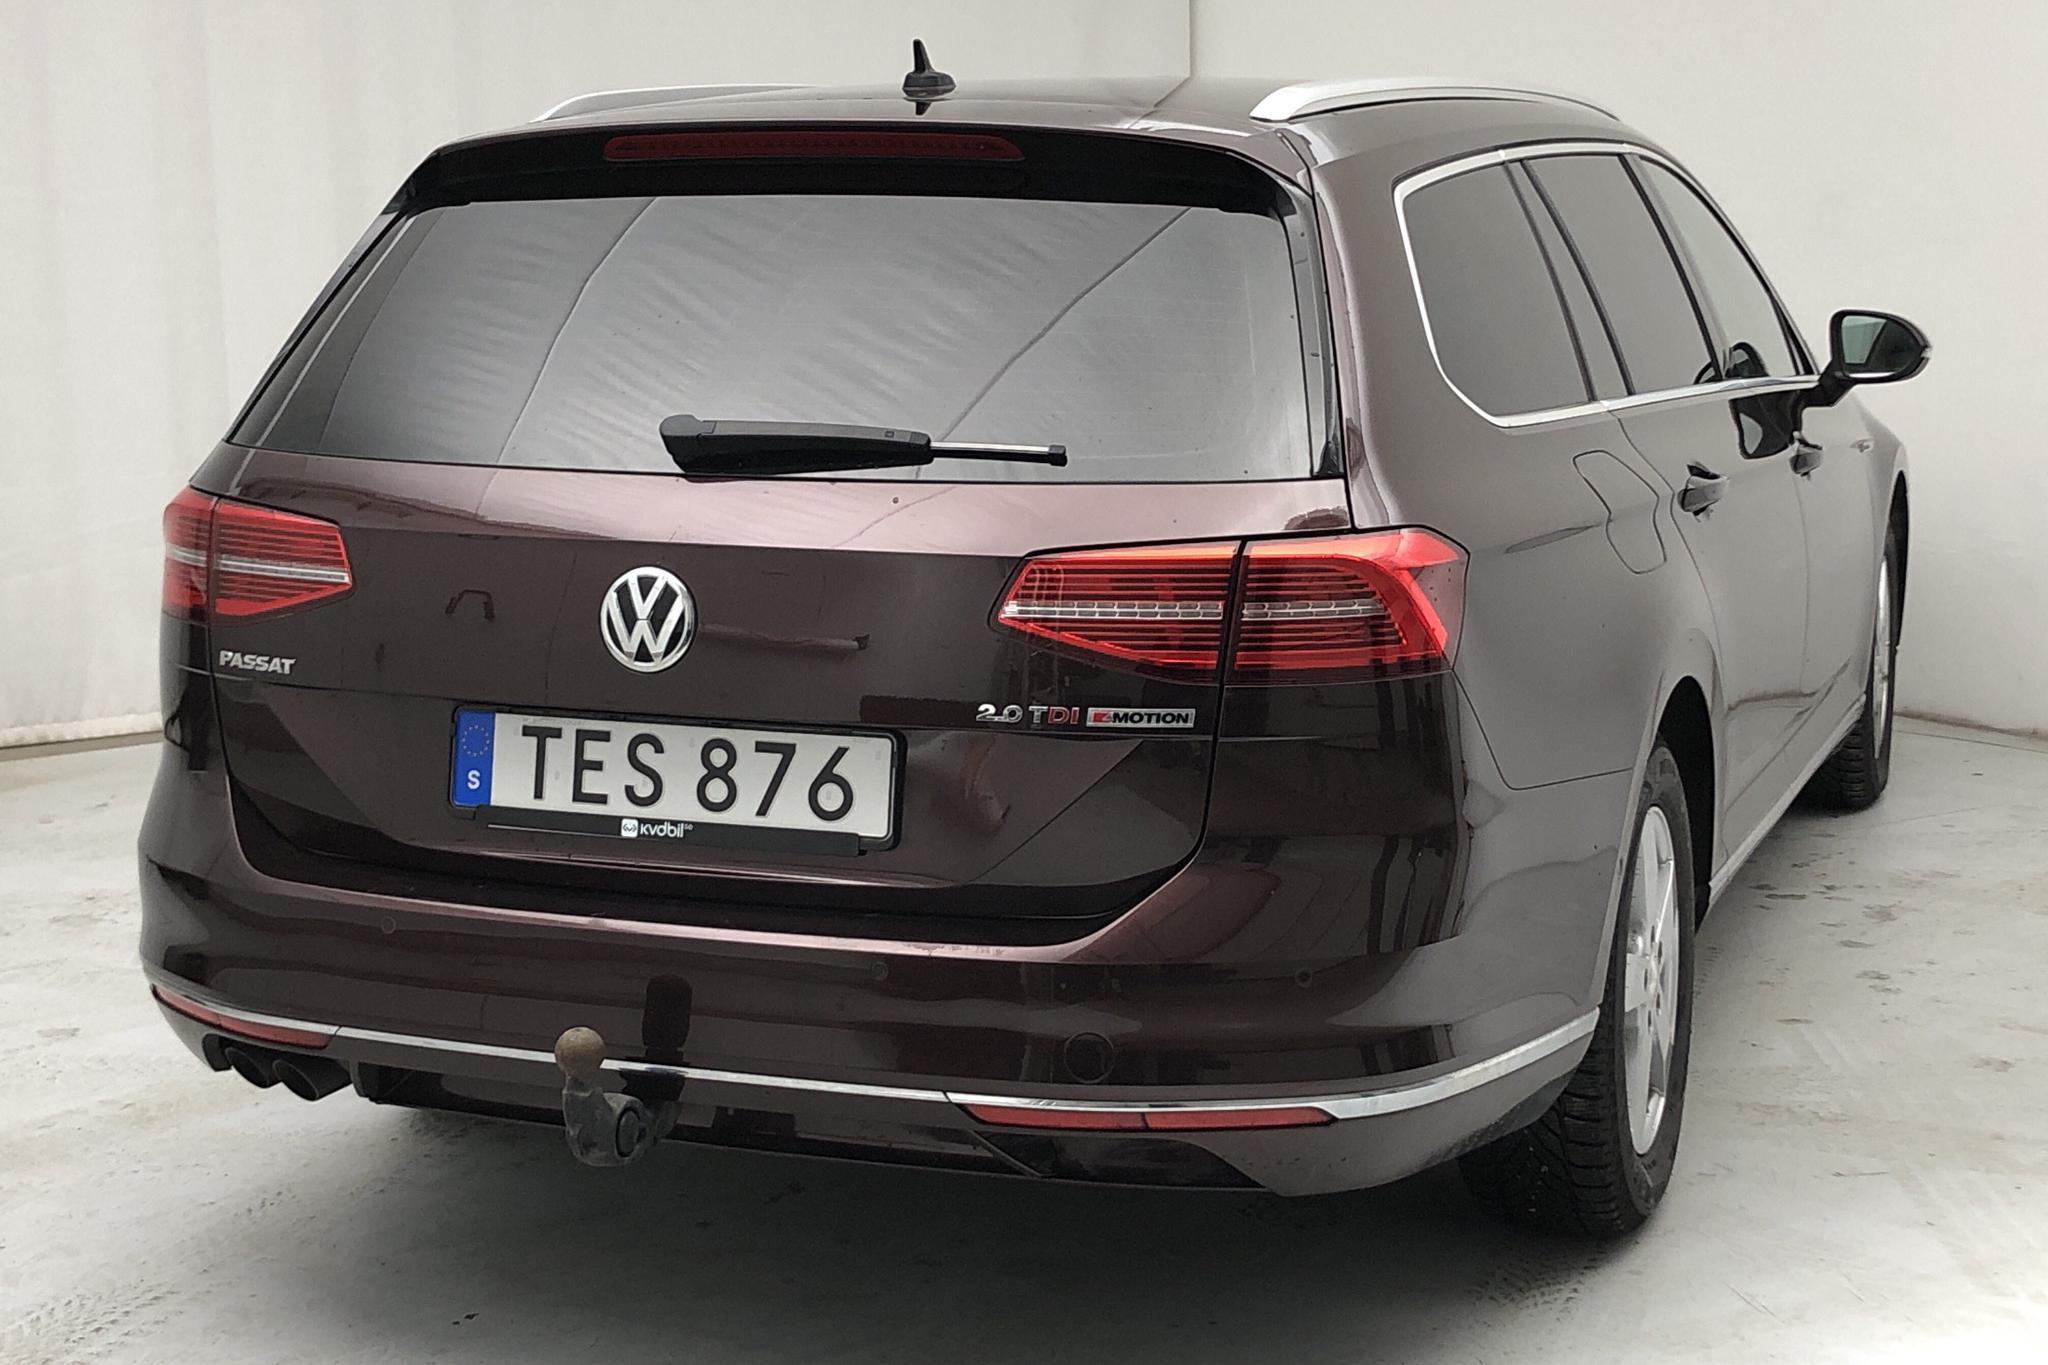 VW Passat 2.0 TDI Sportscombi 4MOTION (190hk) - 7 524 mil - Automat - Dark Red - 2016